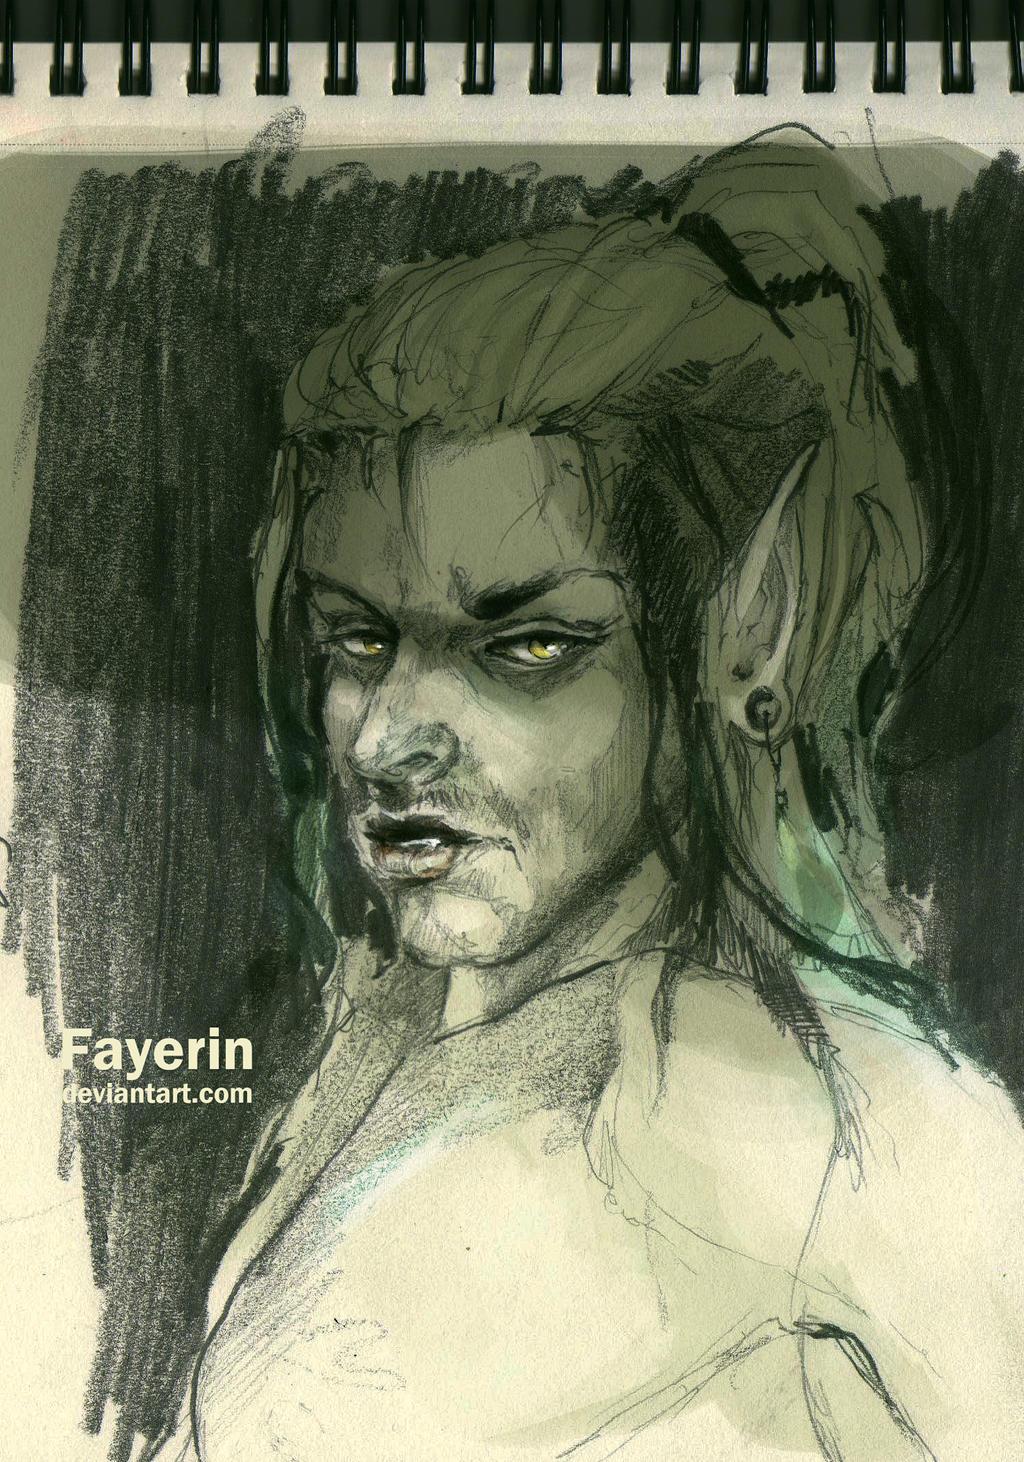 Jude Sketch by Fayerin